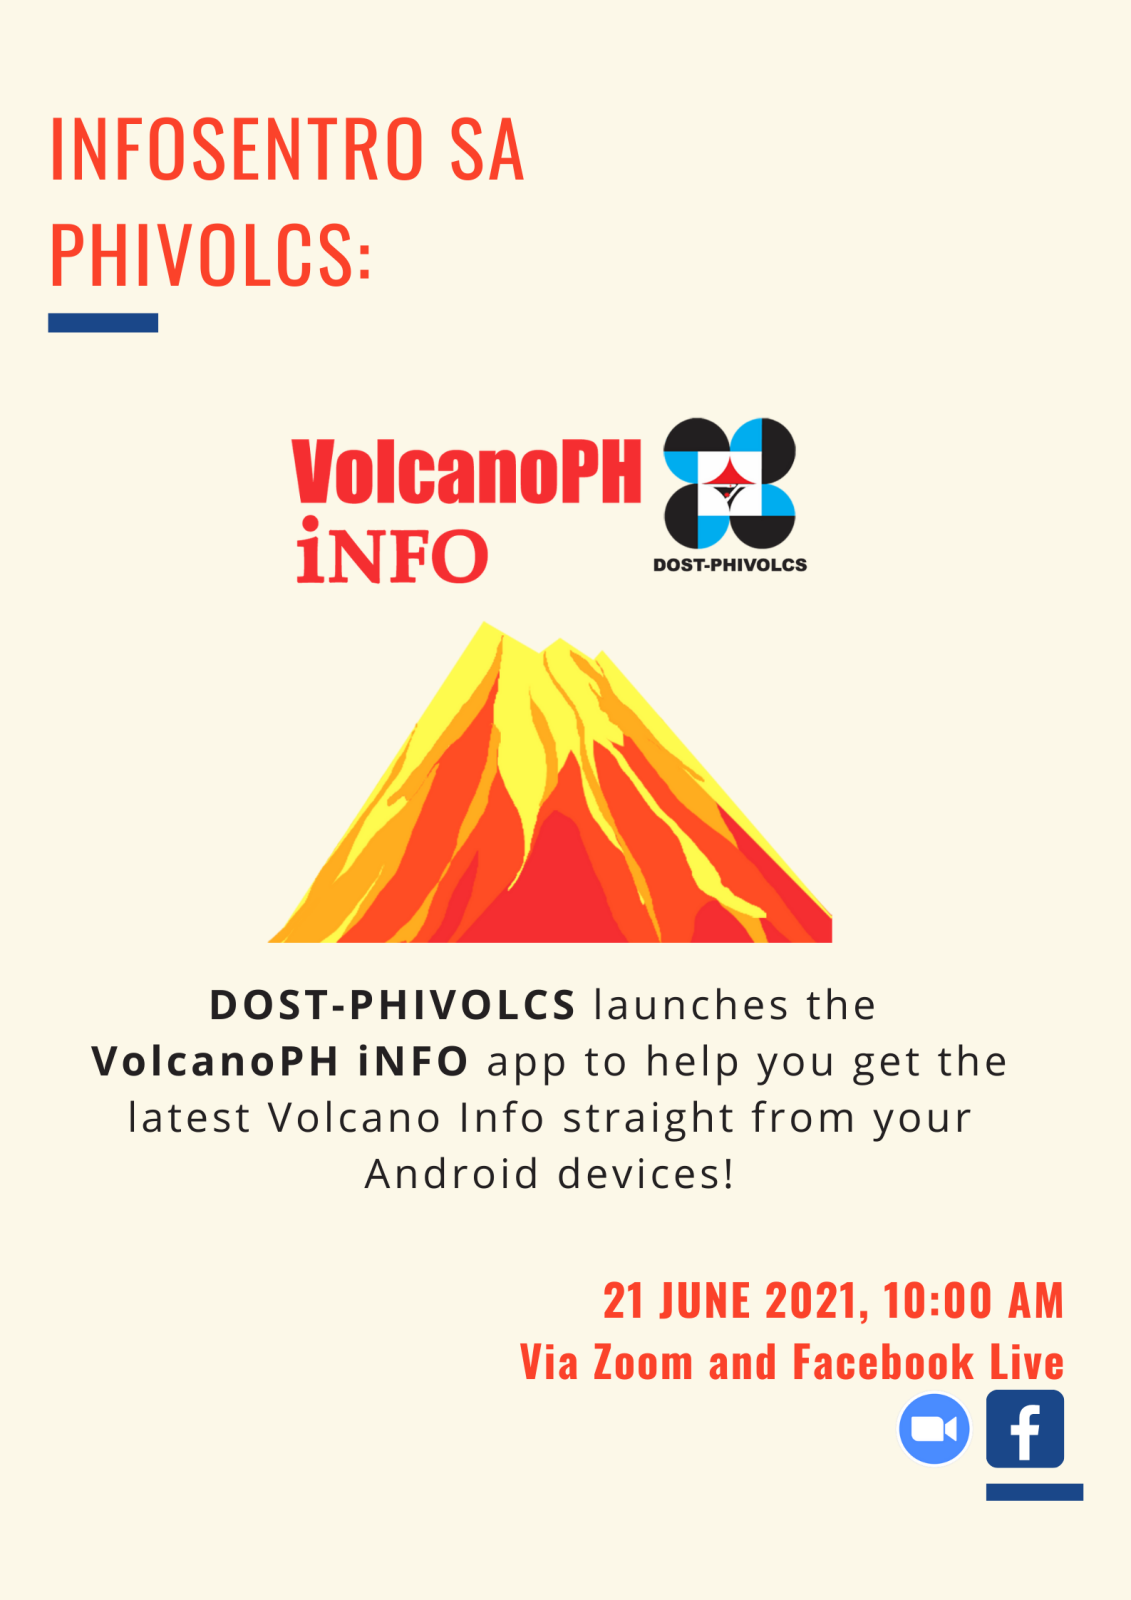 VolcanoPH Info